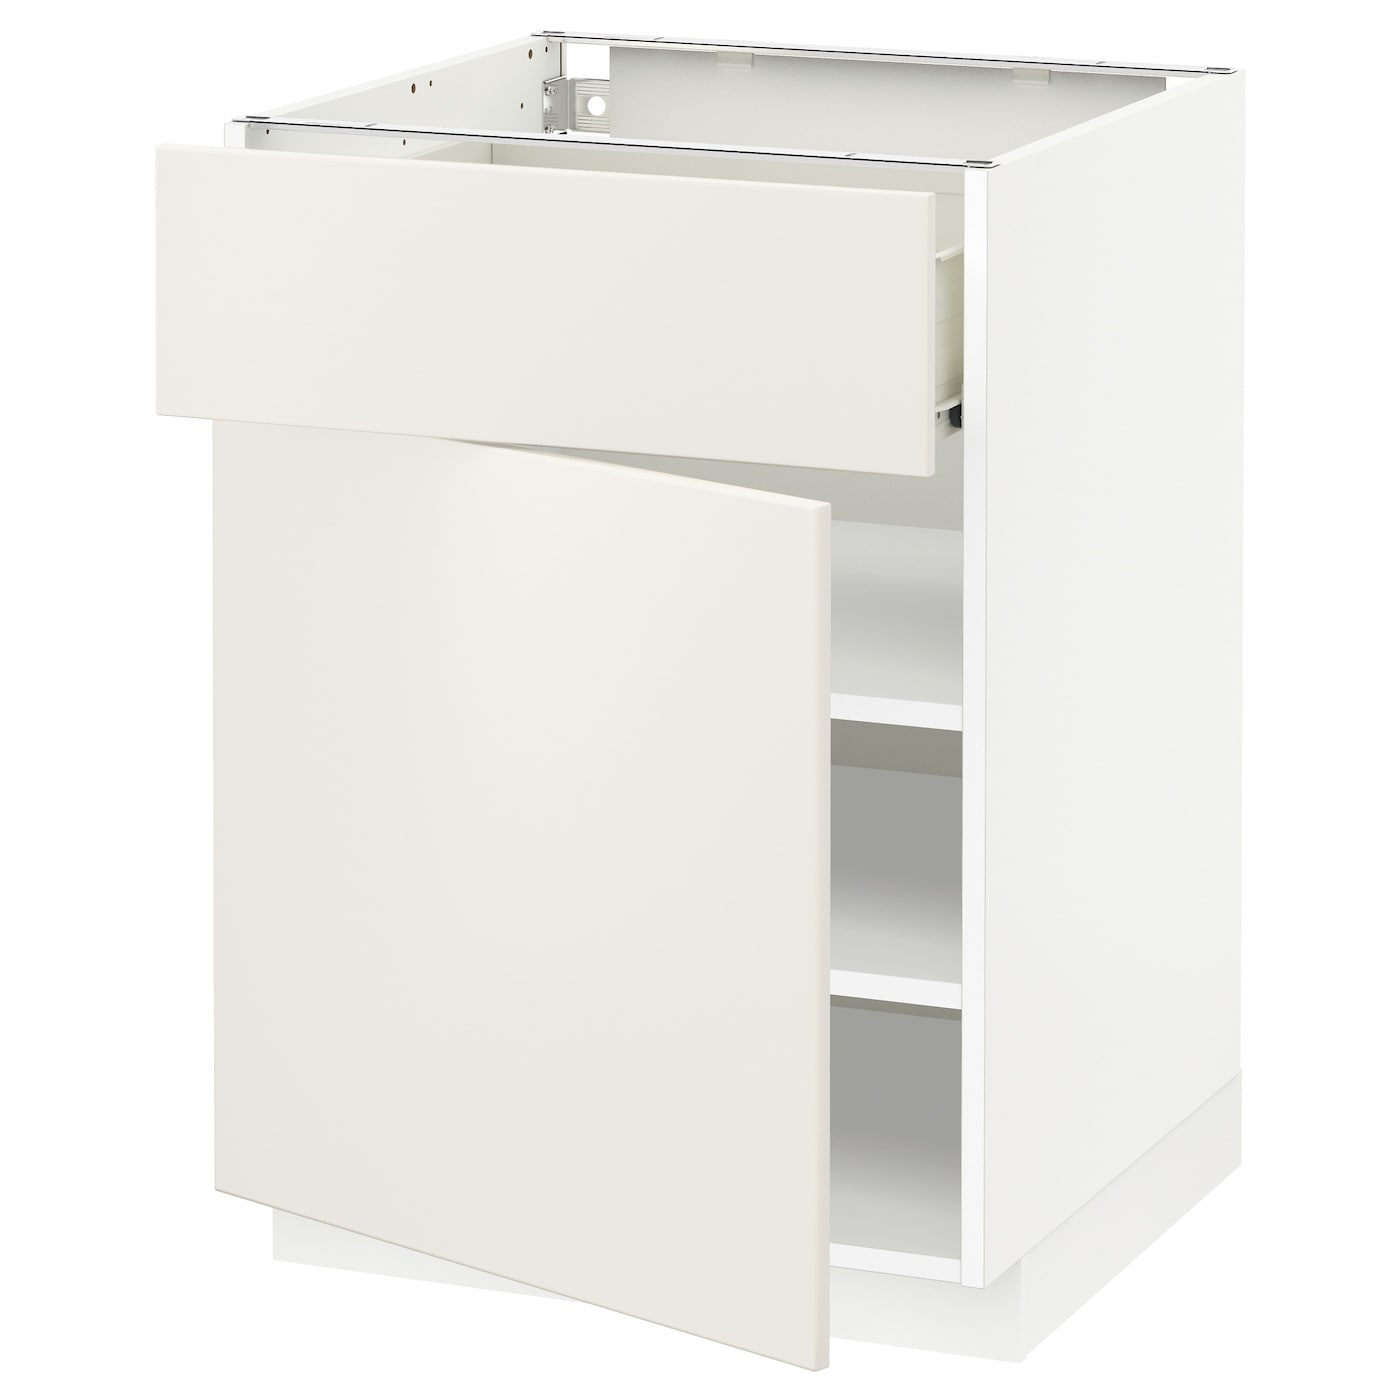 Ikea Kitchen Veddinge White: METOD/FÖRVARA Base Cabinet With Drawer/door White/veddinge